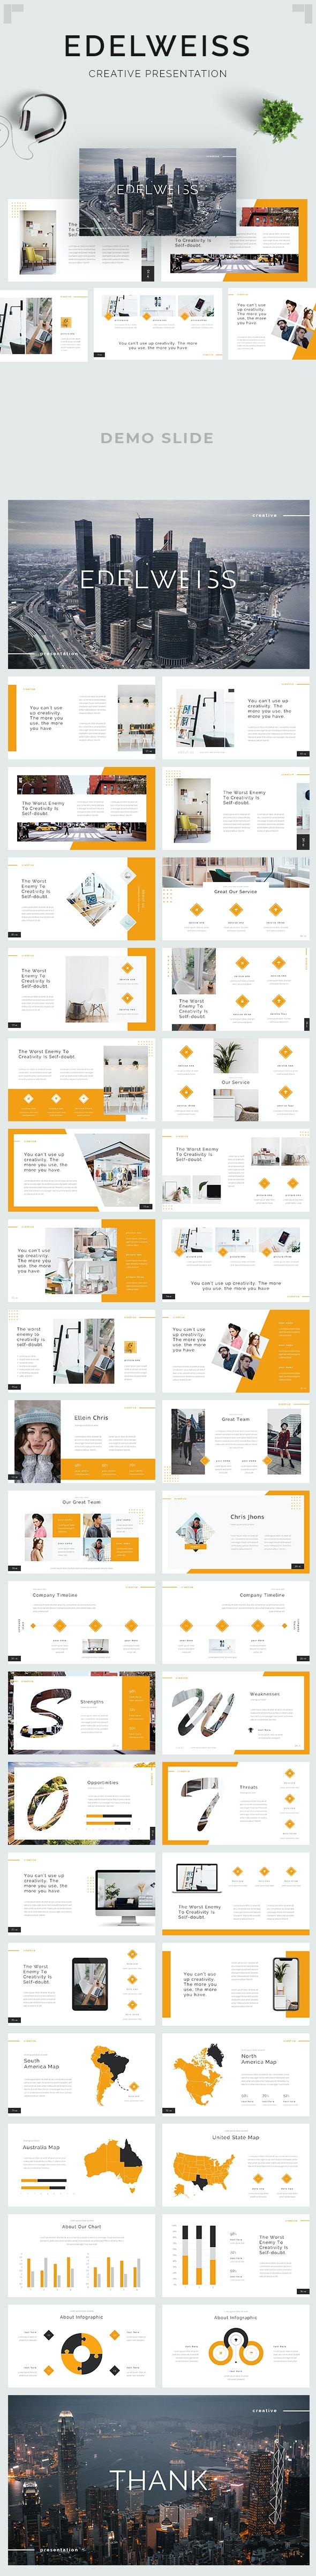 Edelweiss - Creative Google Slides Template - Google Slides Presentation Templates